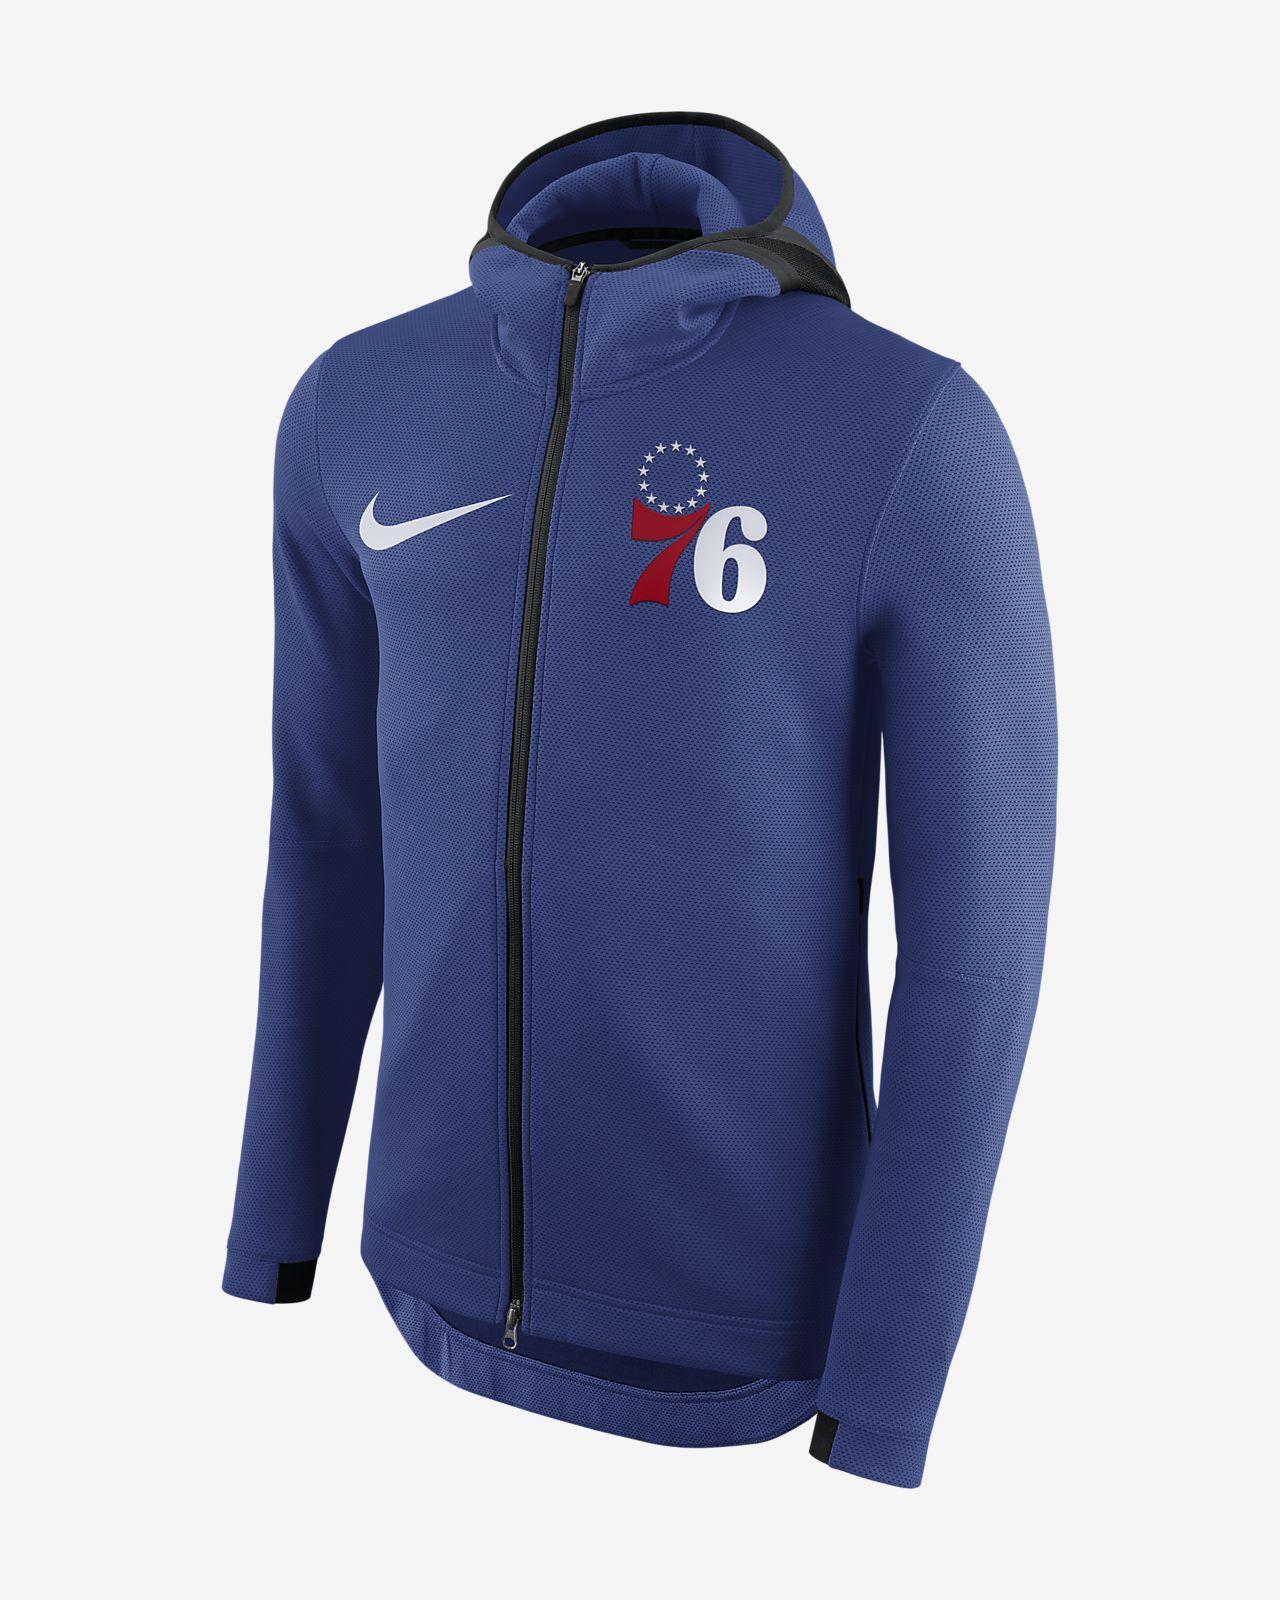 94970458c24 Philadelphia 76ers Nike Therma Flex Showtime Men s NBA Hoodie. Nike.com